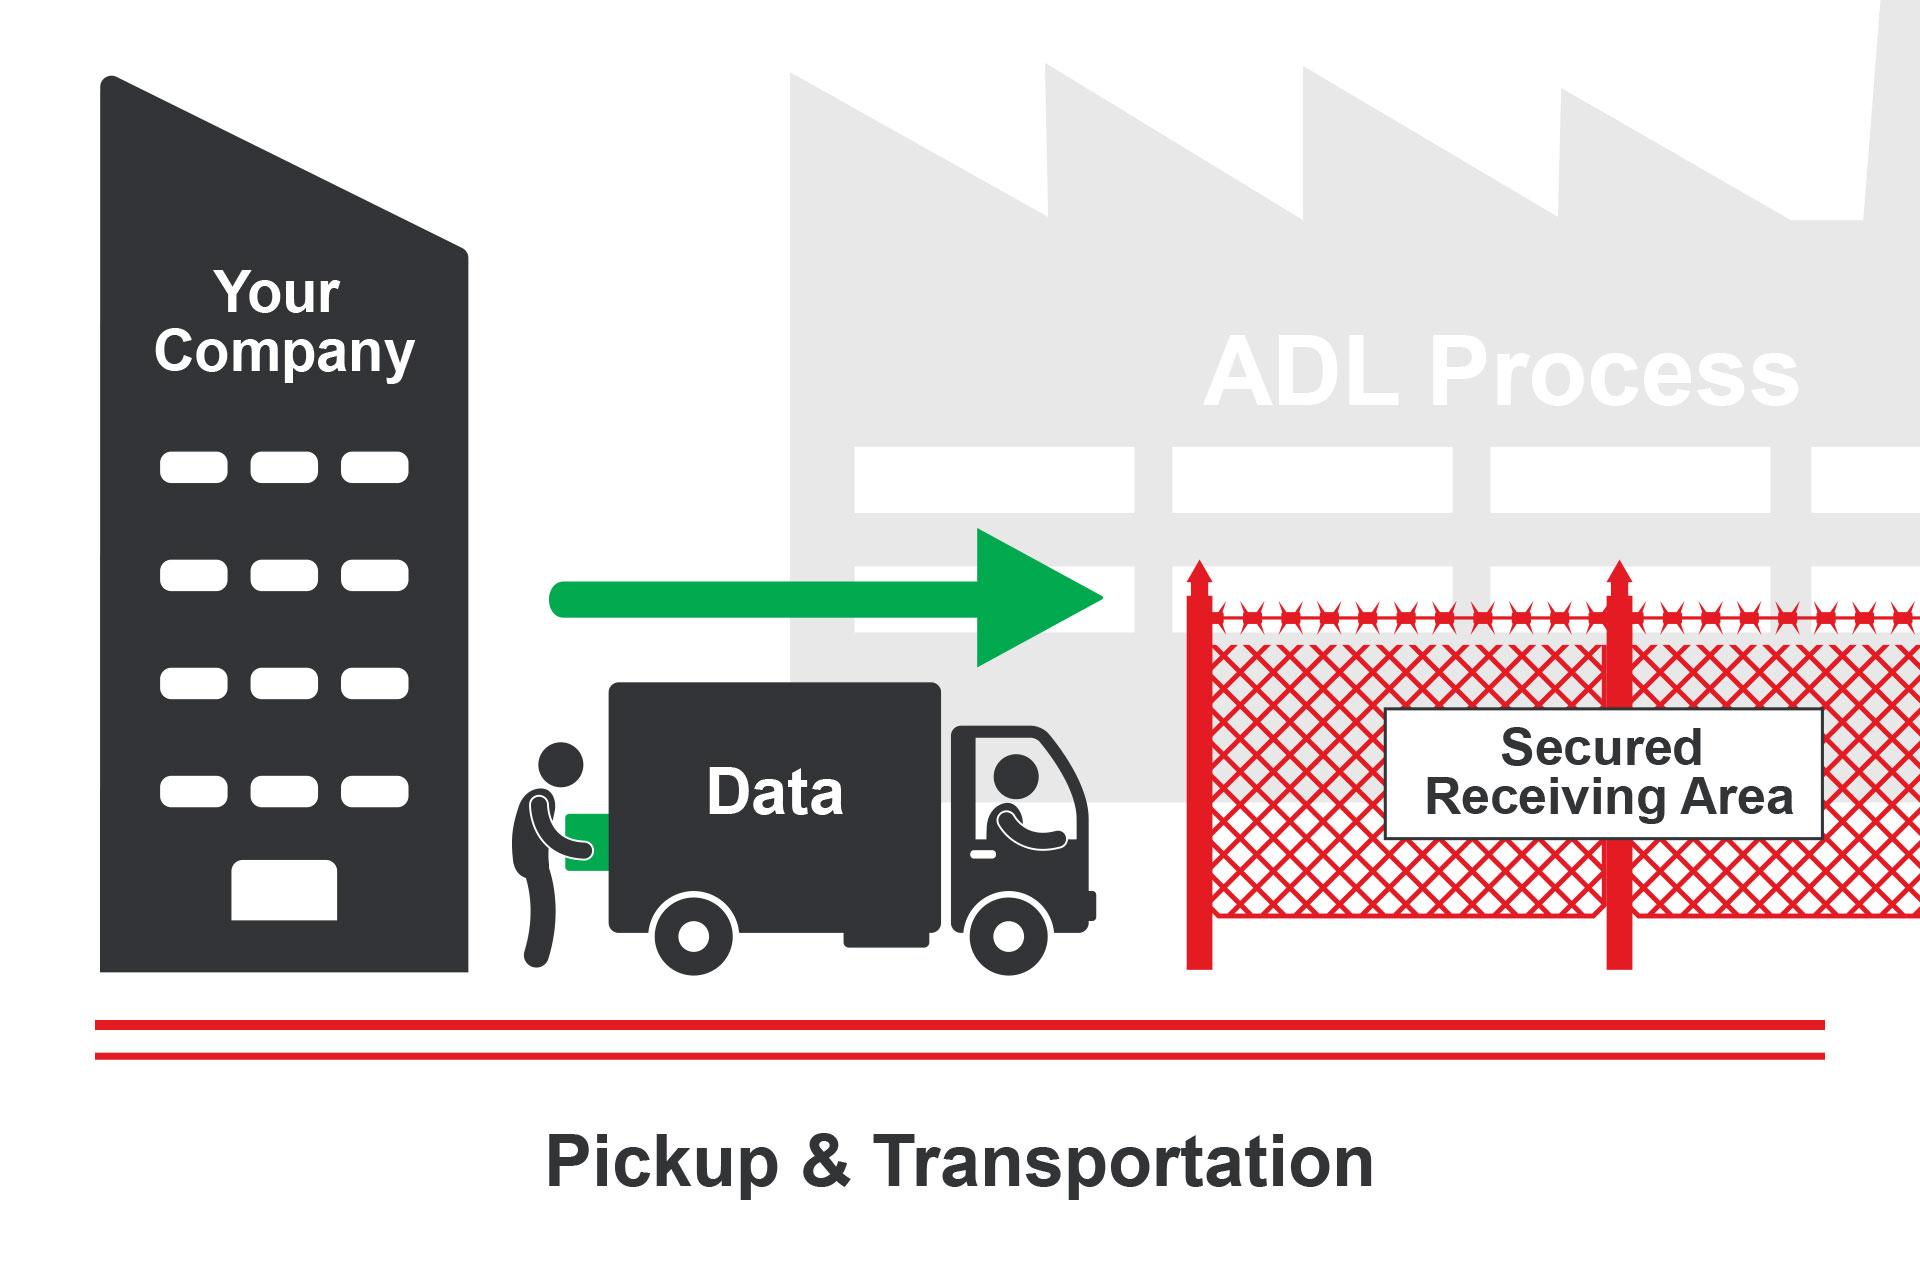 Pickup & Transportation